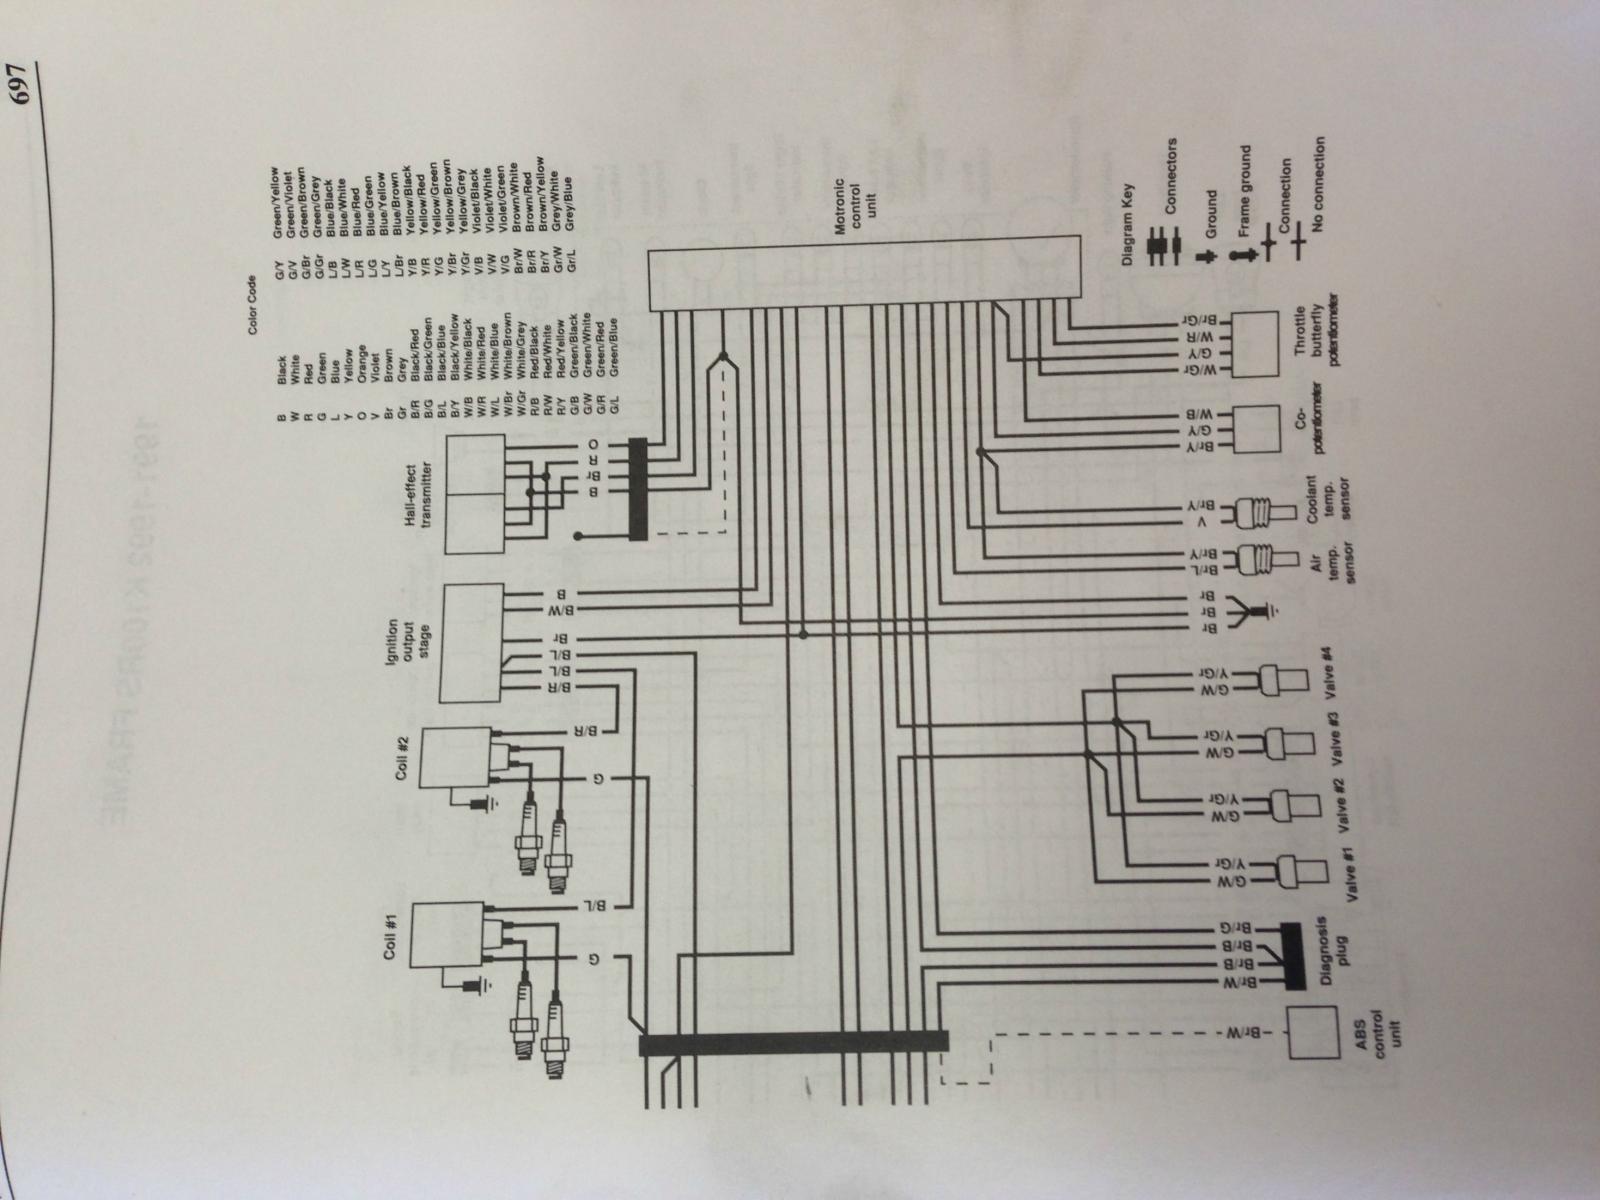 [DIAGRAM_3NM]  LV_3525] 1982 Kawasaki Kz1300 Wiring Diagrams Schematic Wiring   Kawasaki 1300 Wiring Diagram      Ynthe Funi Icism Viewor Mohammedshrine Librar Wiring 101